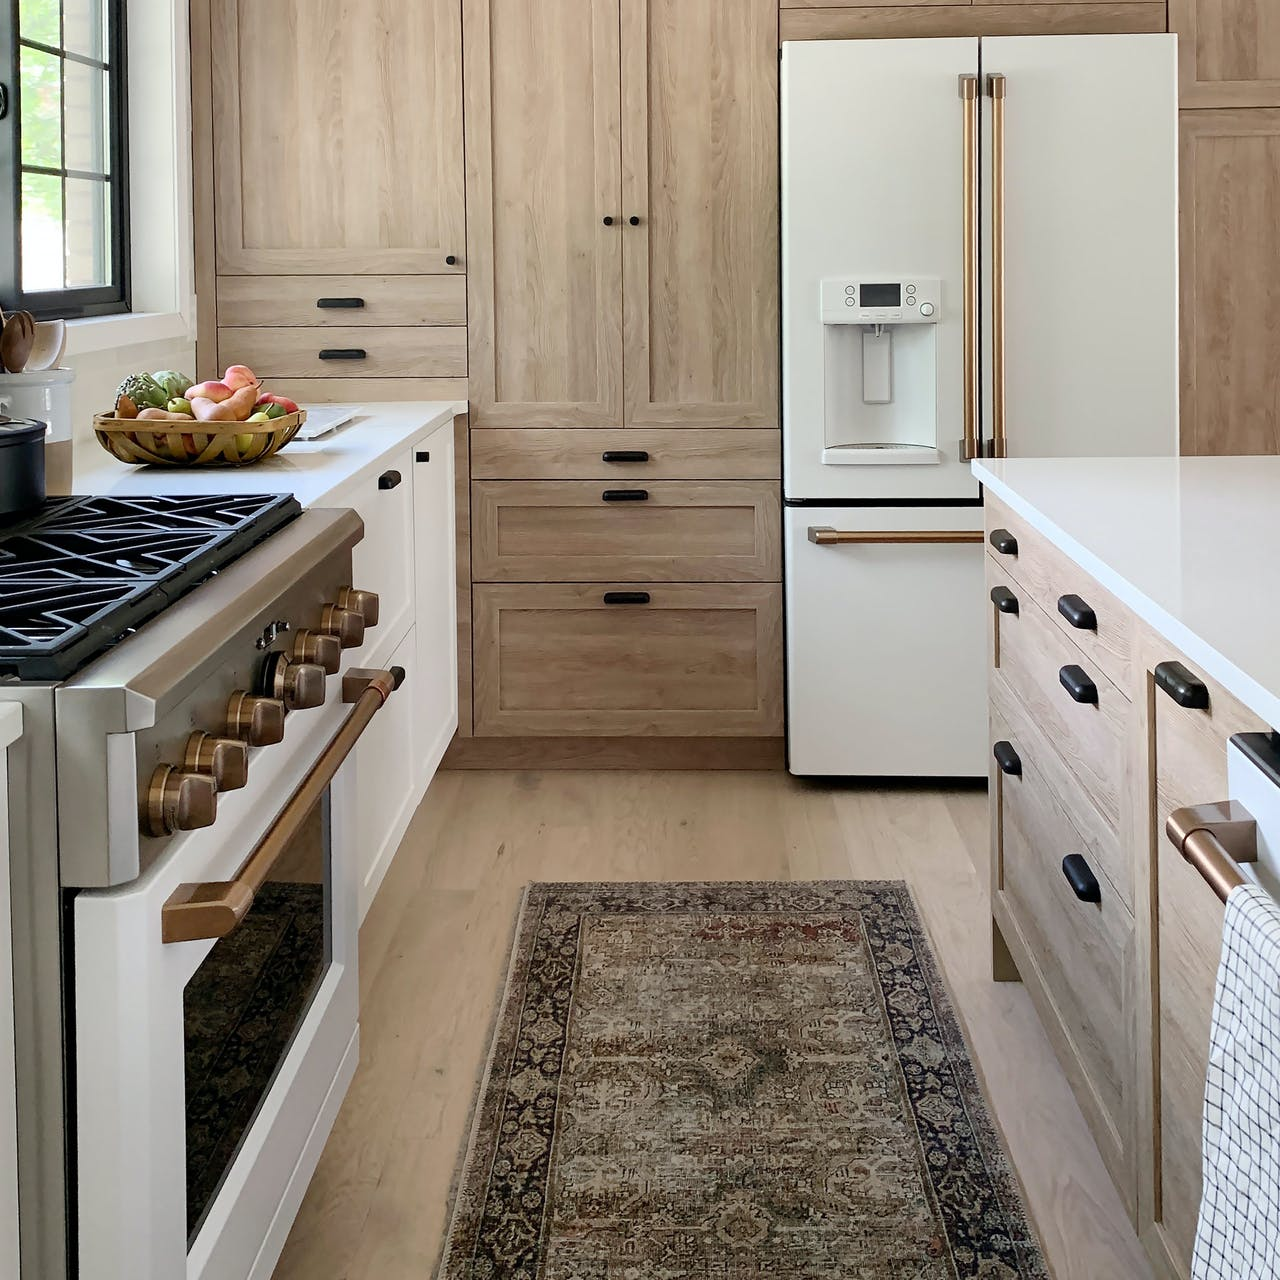 café matte white appliances in semihandmade cabinets